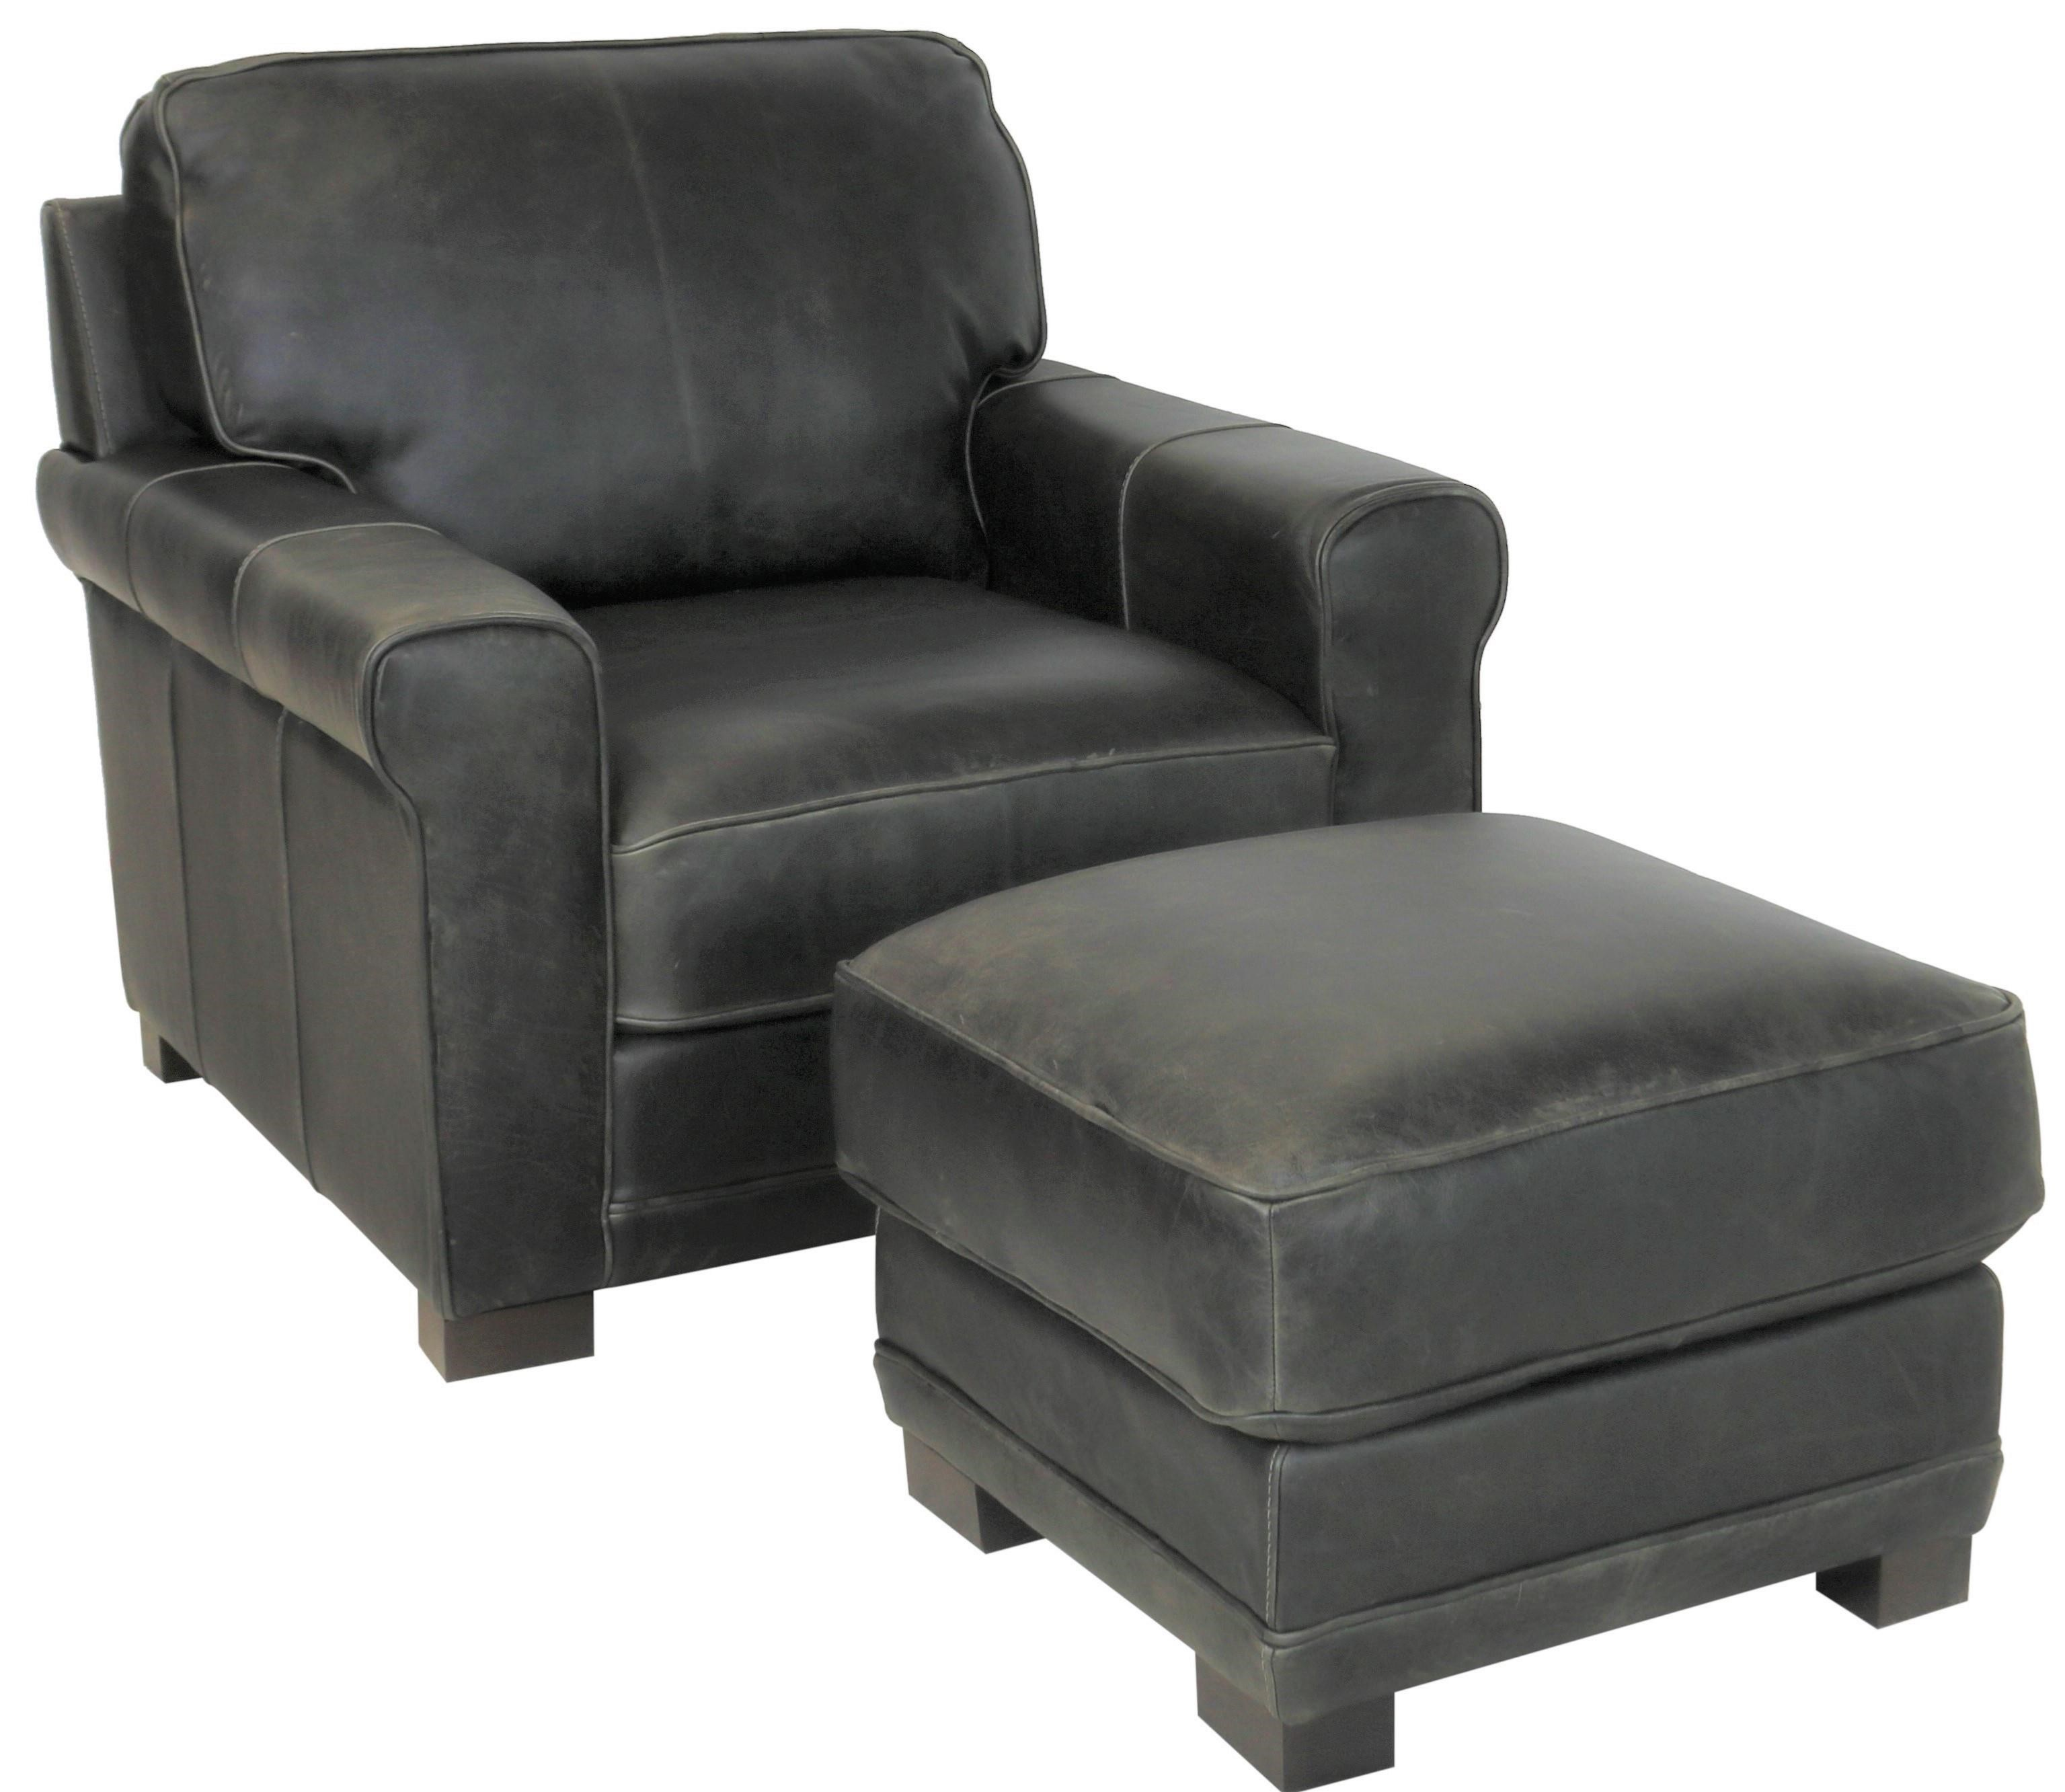 gio collection chair and ottoman